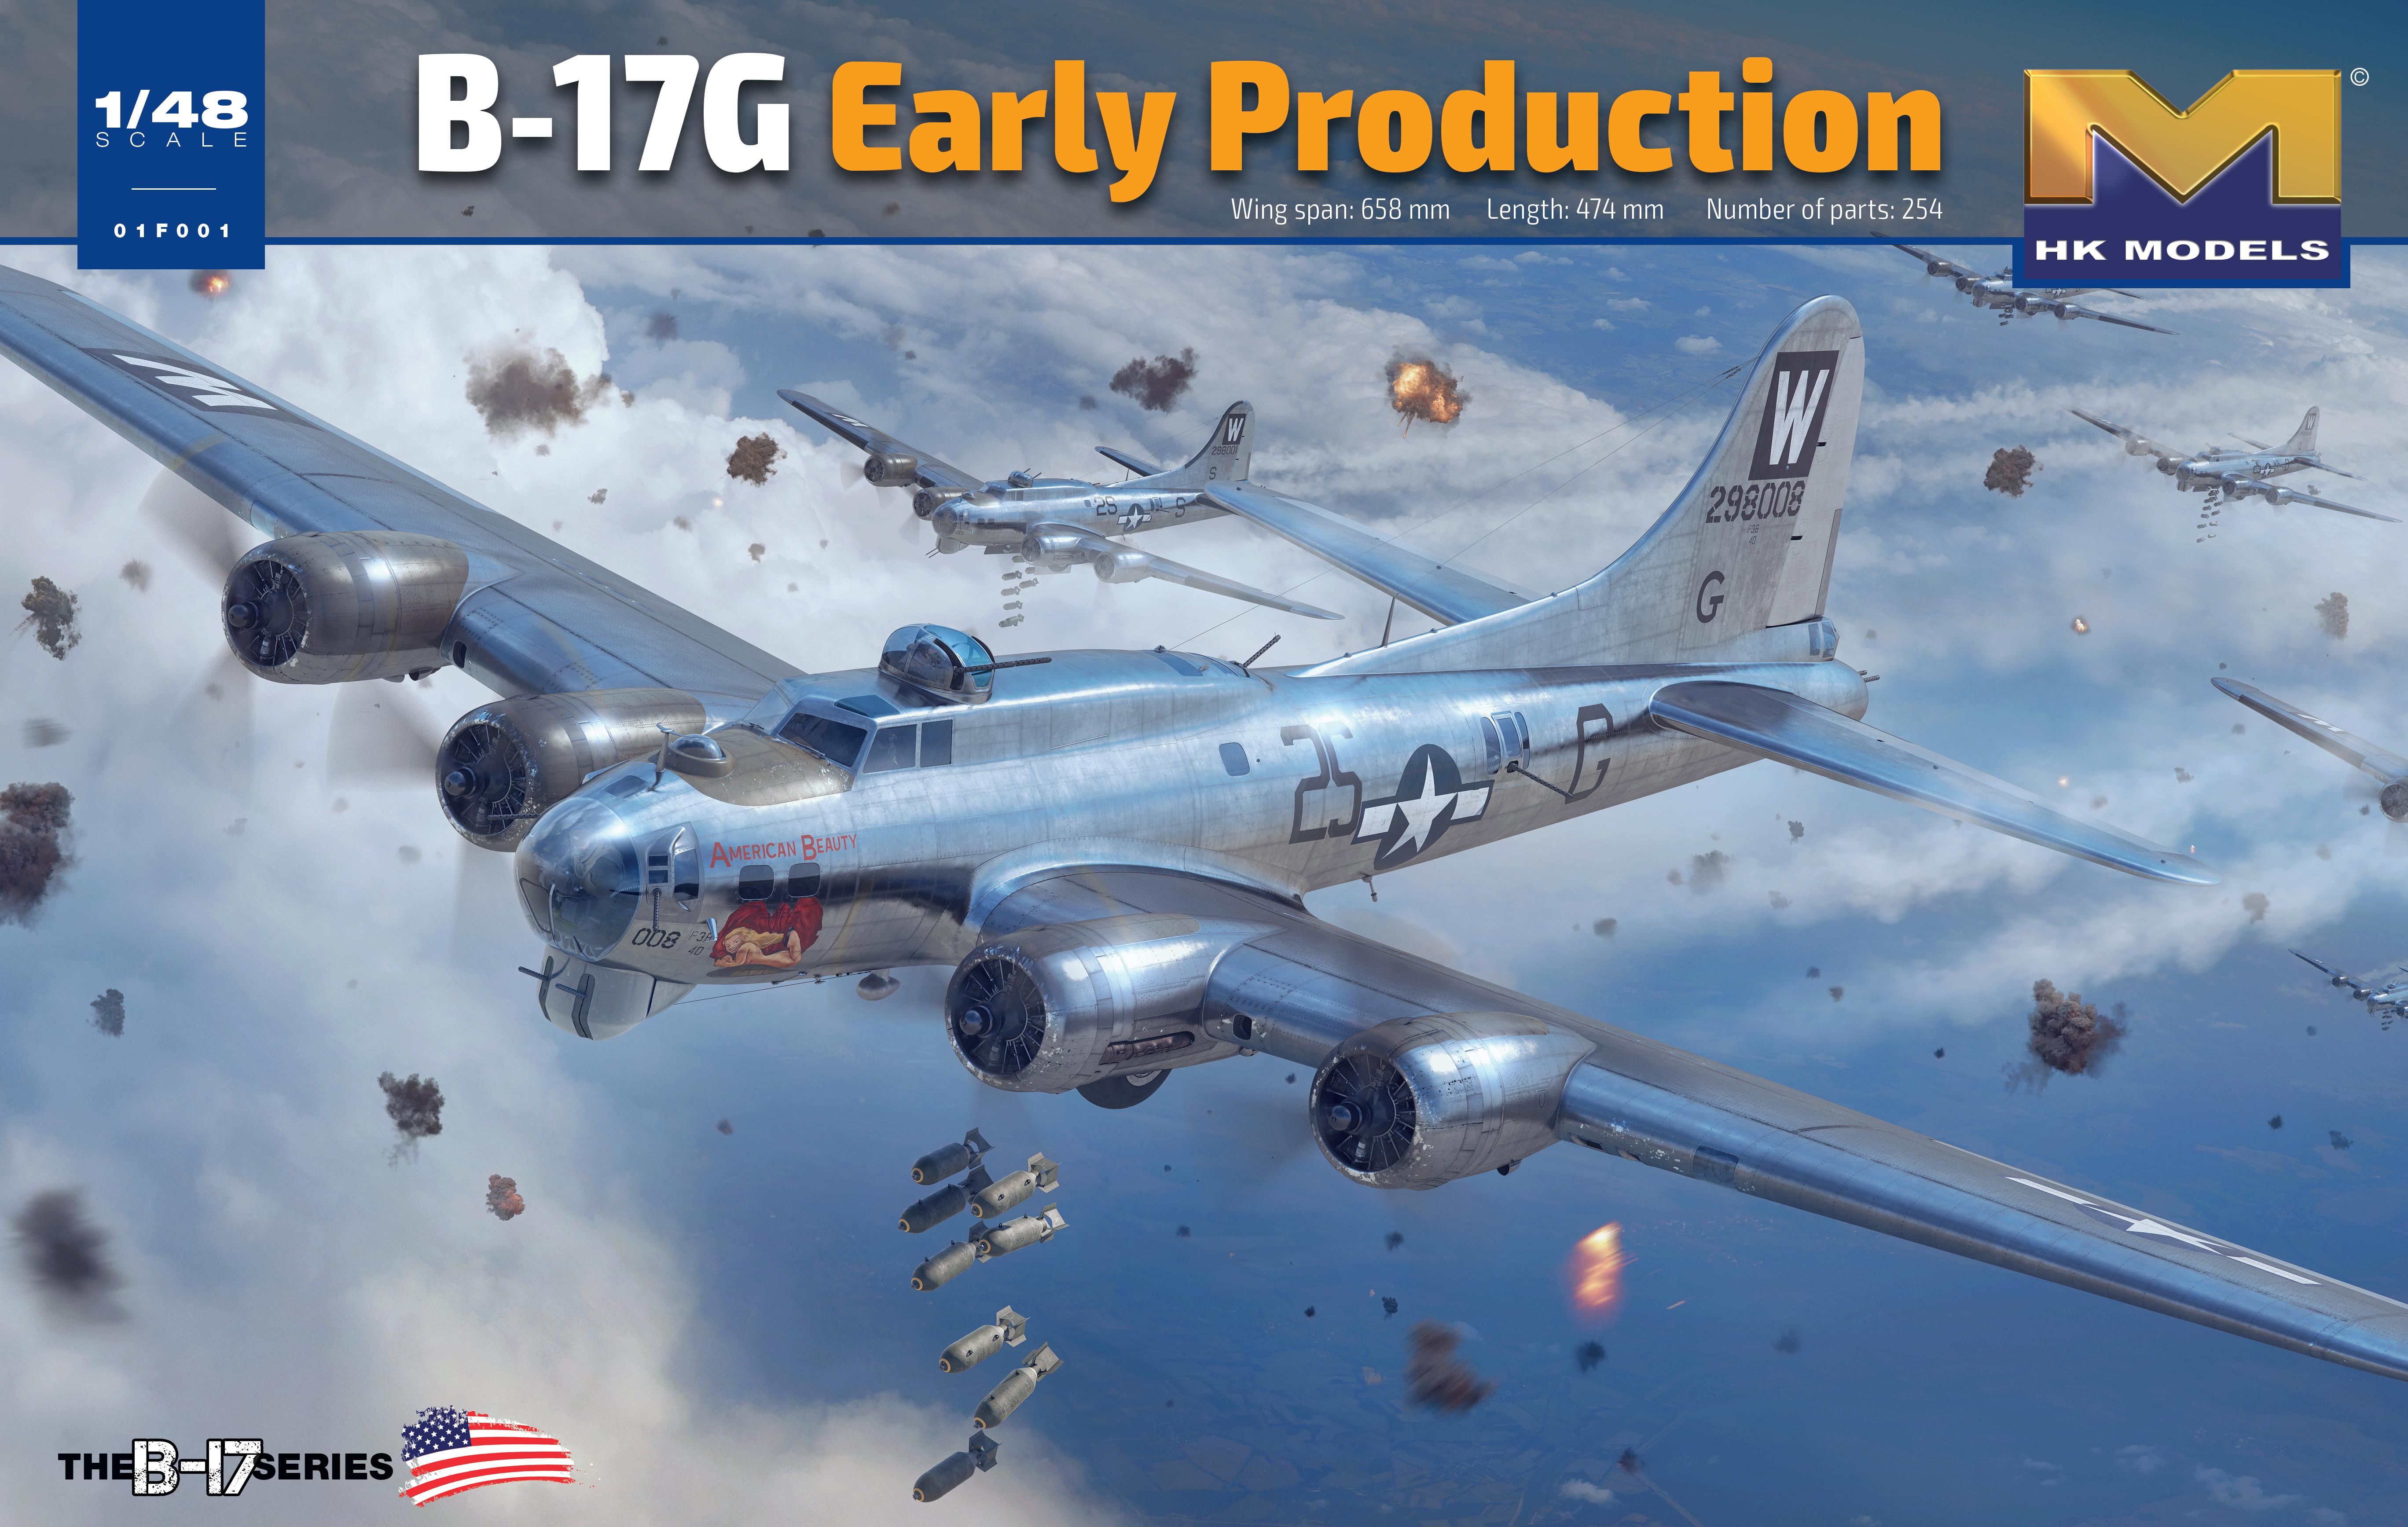 HK Models 1/48 B-17G Early Production, Aircraft